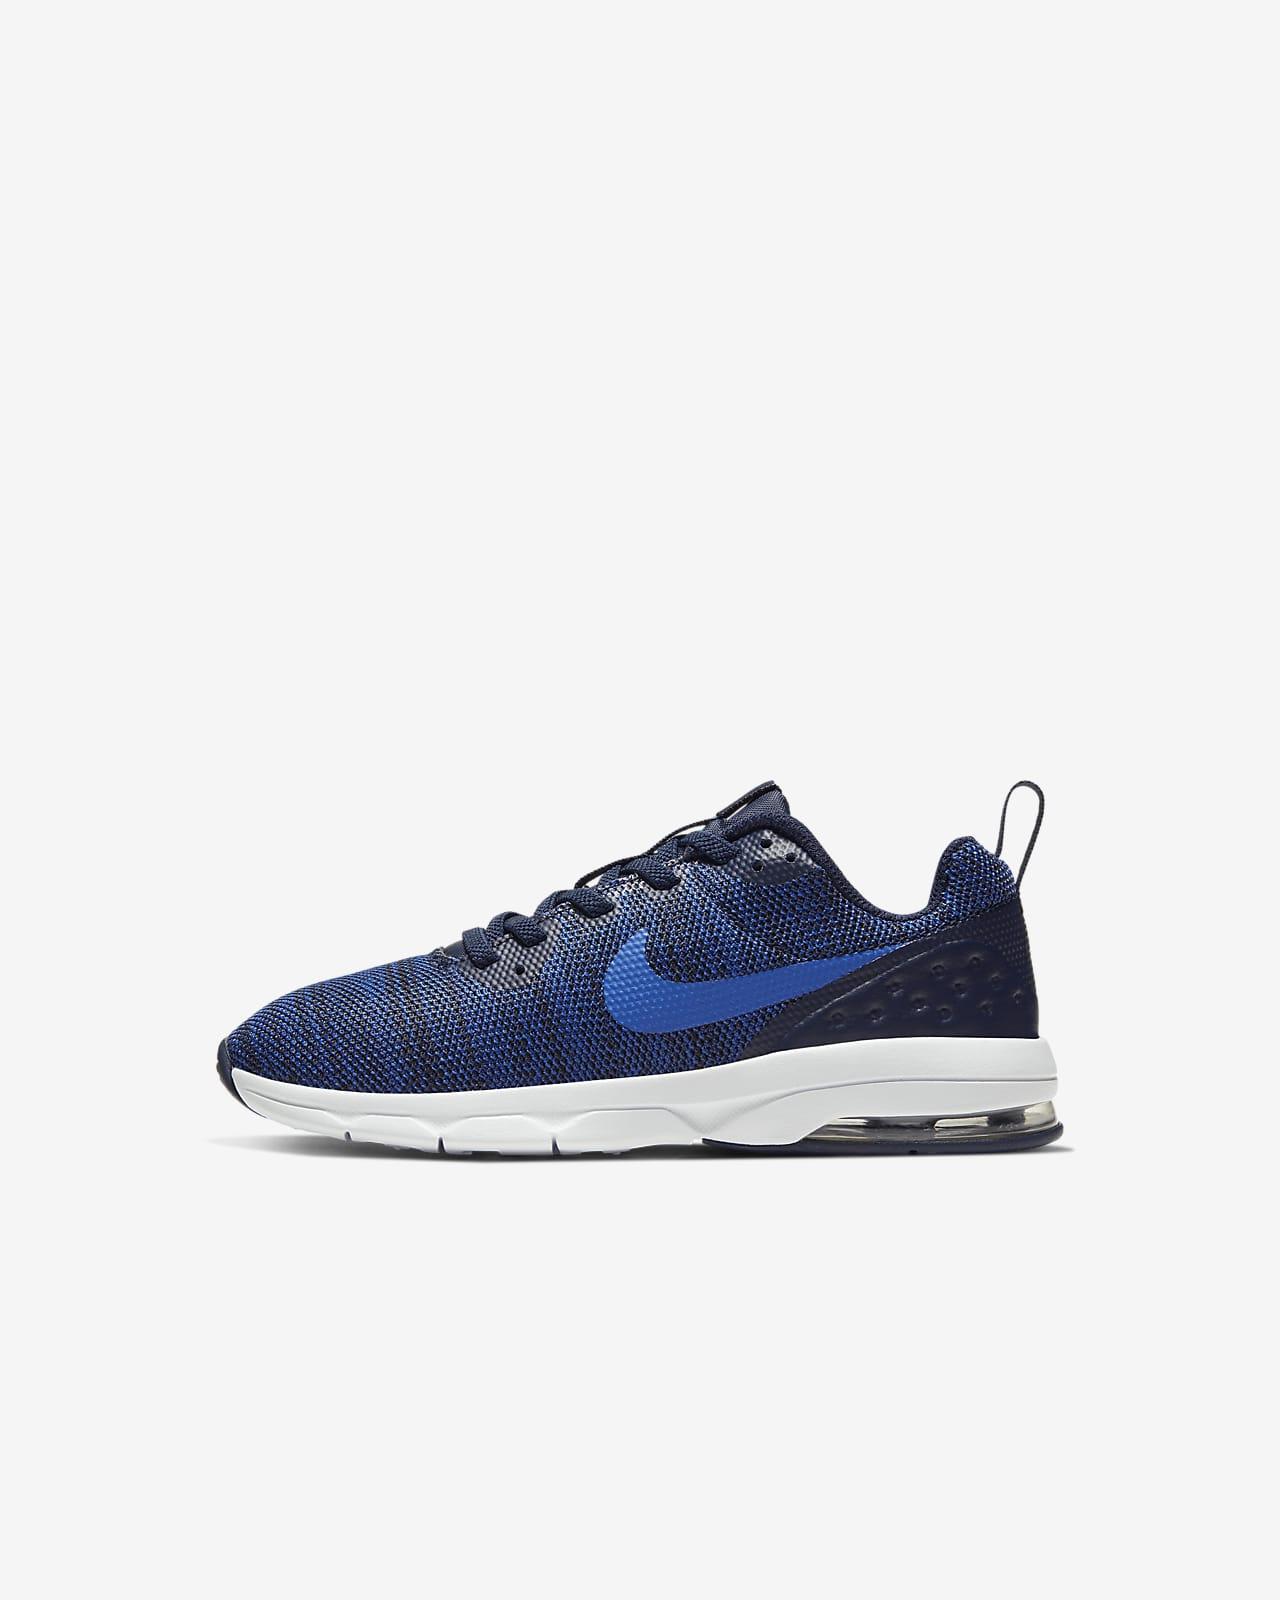 Nike Air Max Motion LW (PSV) 幼童运动童鞋